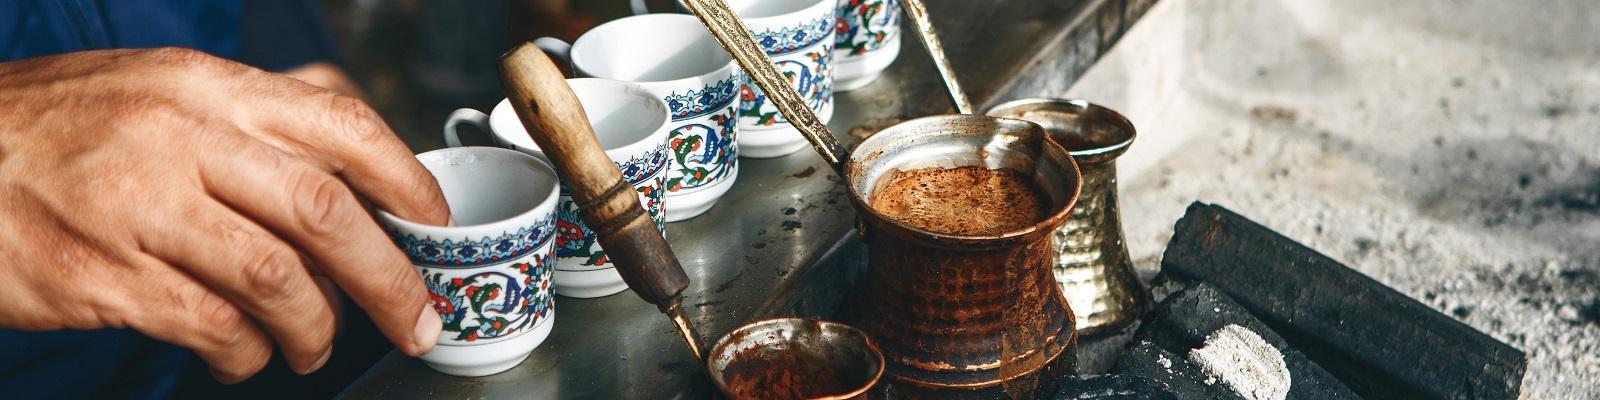 A person brews Turkish coffee in Istanbul. Photo: franz12 / Shutterstock